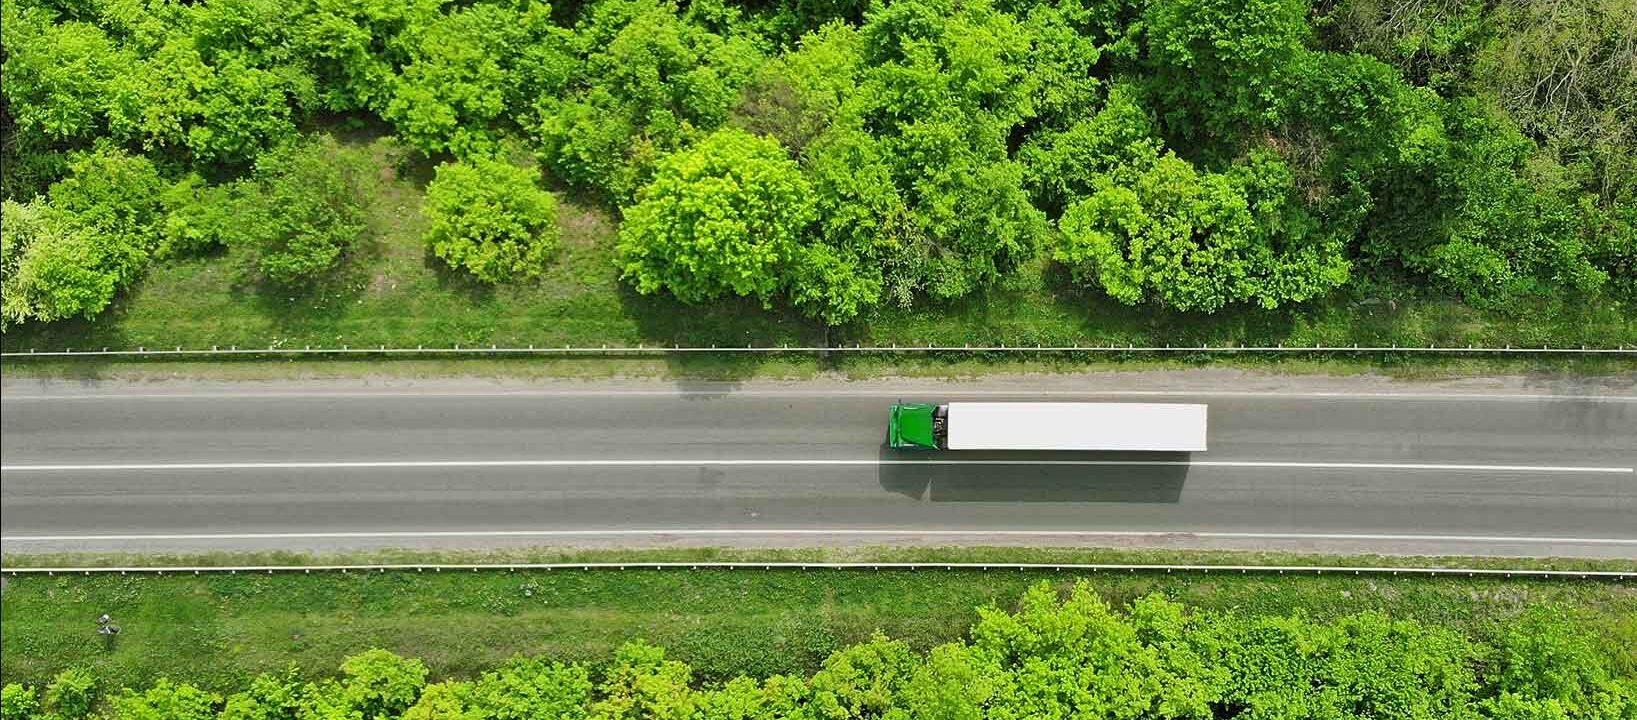 Groen transport